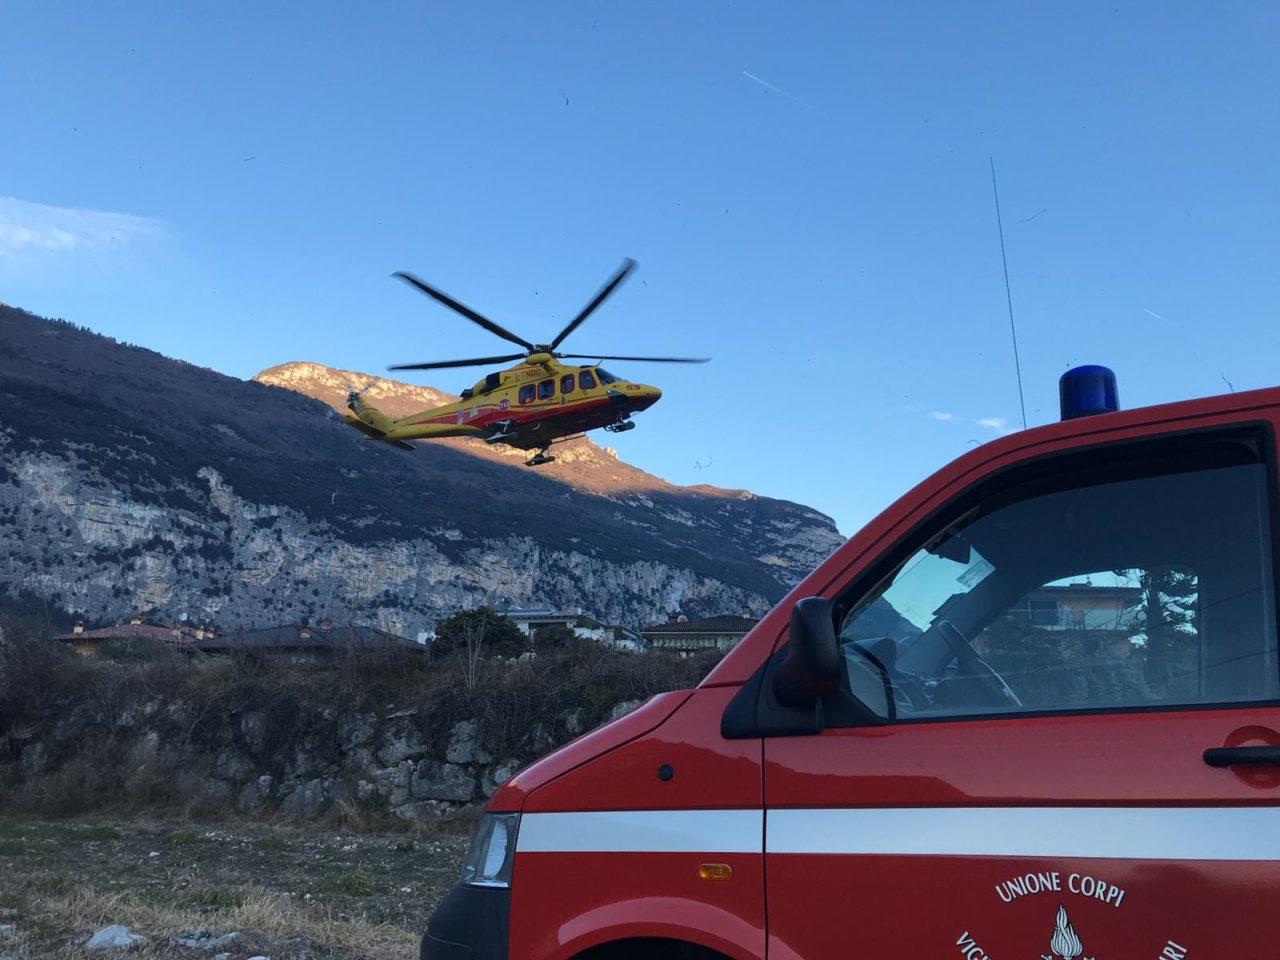 elicottero malore ceniga dro IMG-20200117-WA0008